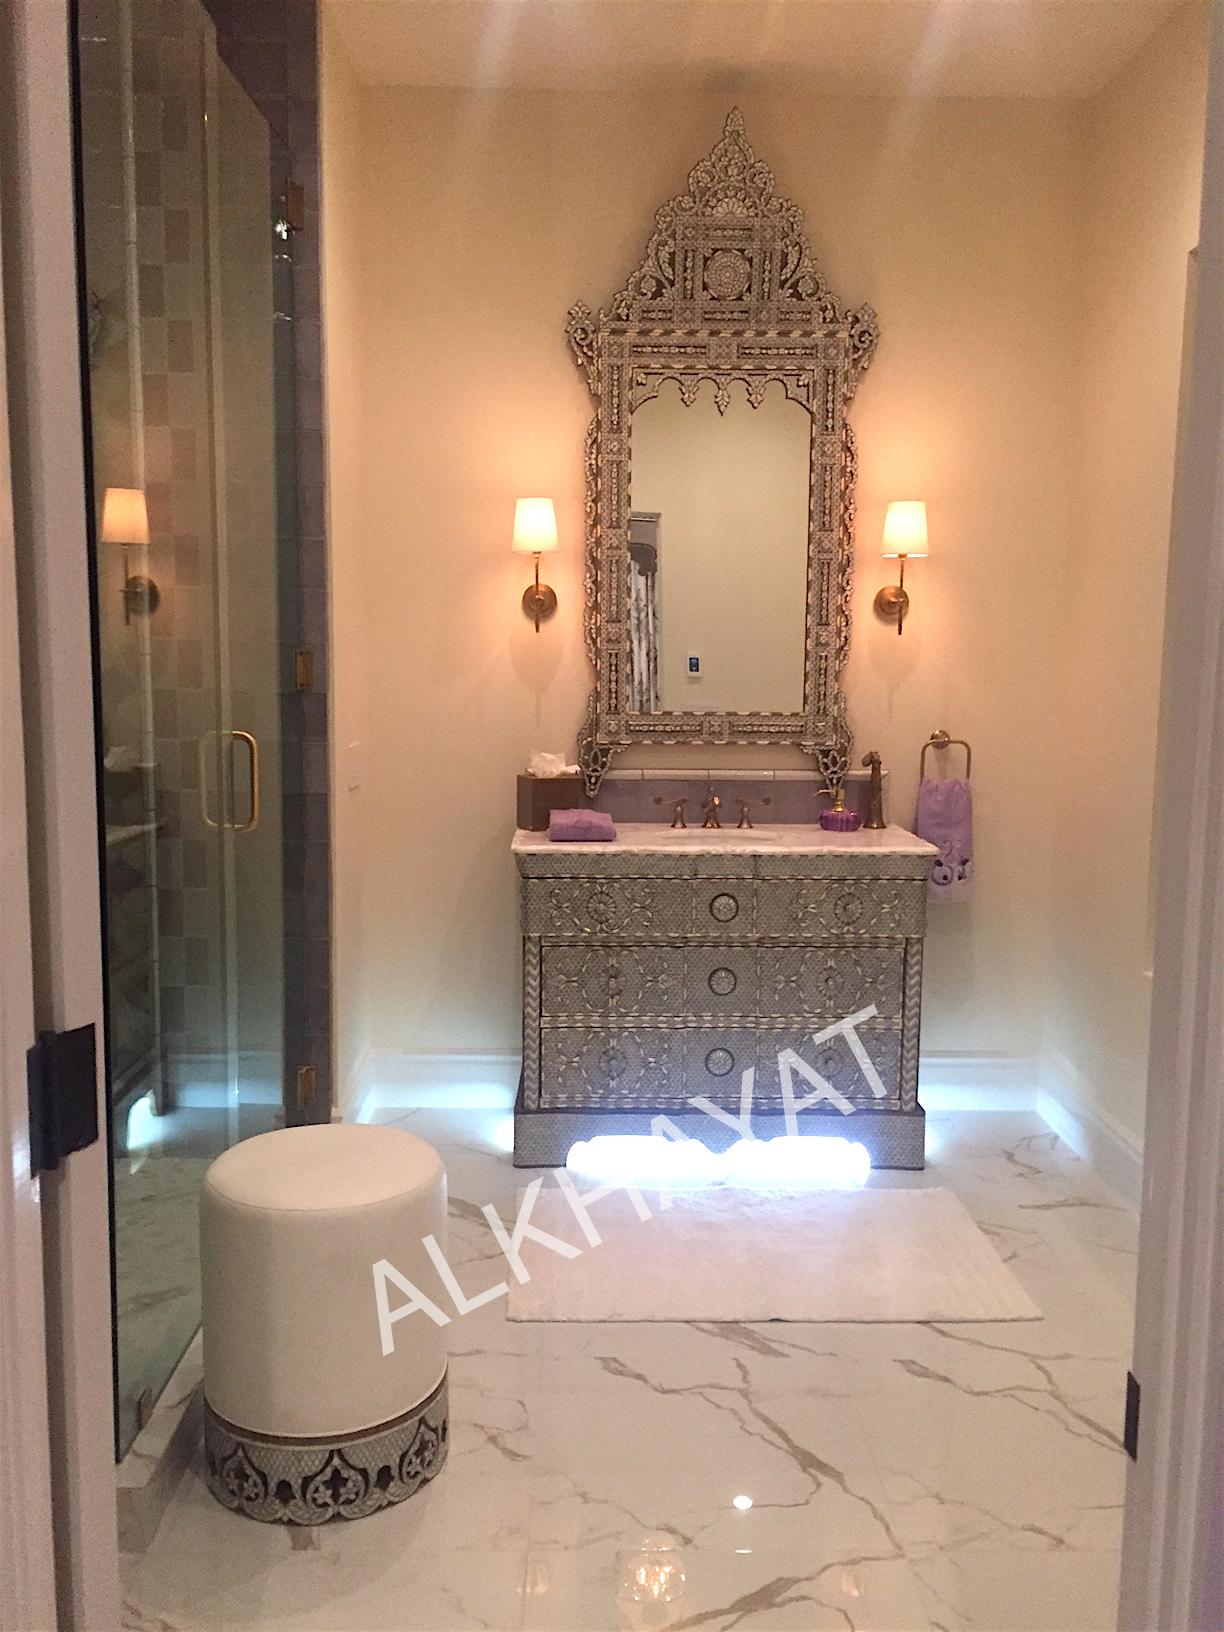 Single sink vanity & Moroccan mirror